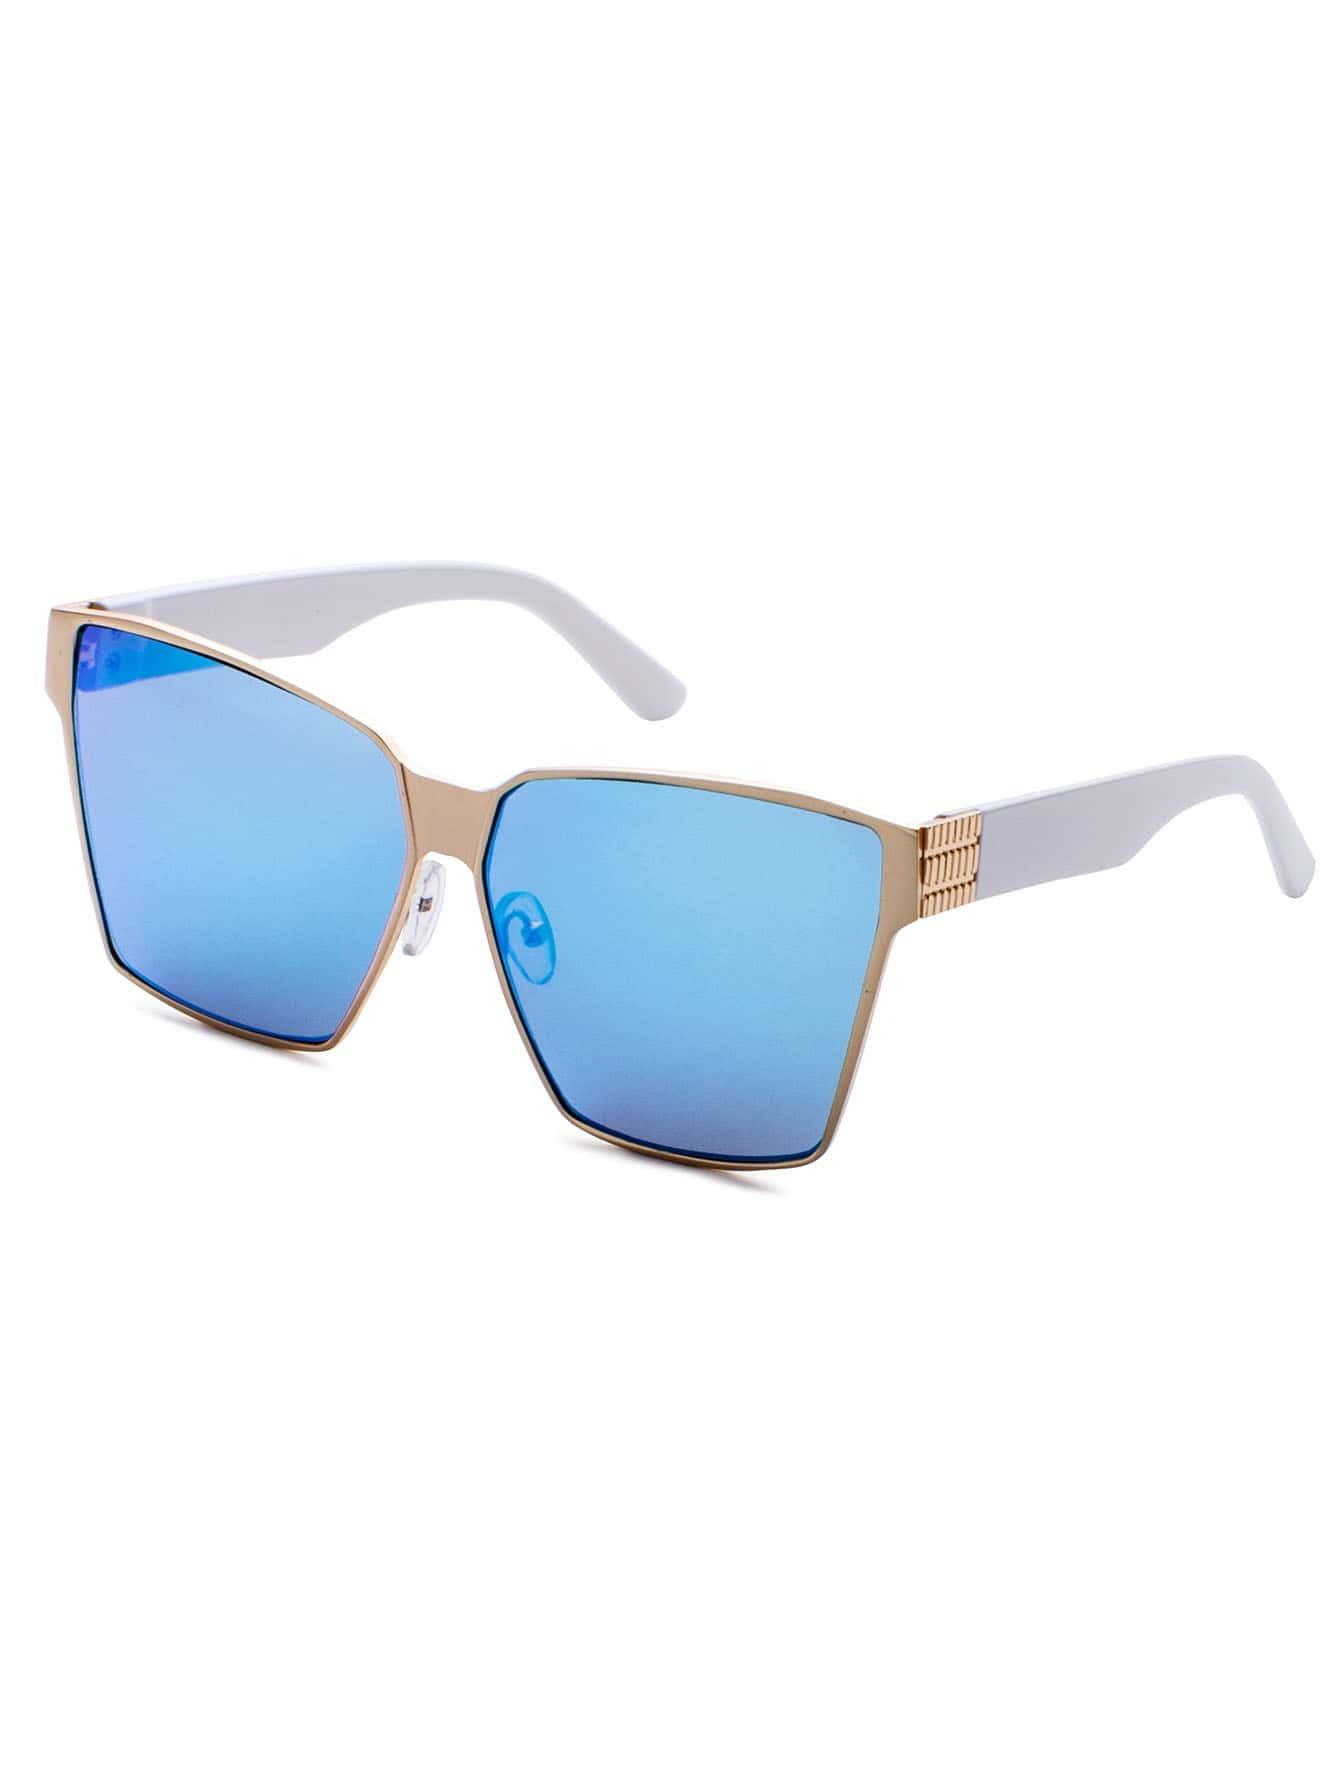 Metal Geometric Frame Blue Lens SunglassesMetal Geometric Frame Blue Lens Sunglasses<br><br>color: Blue<br>size: None